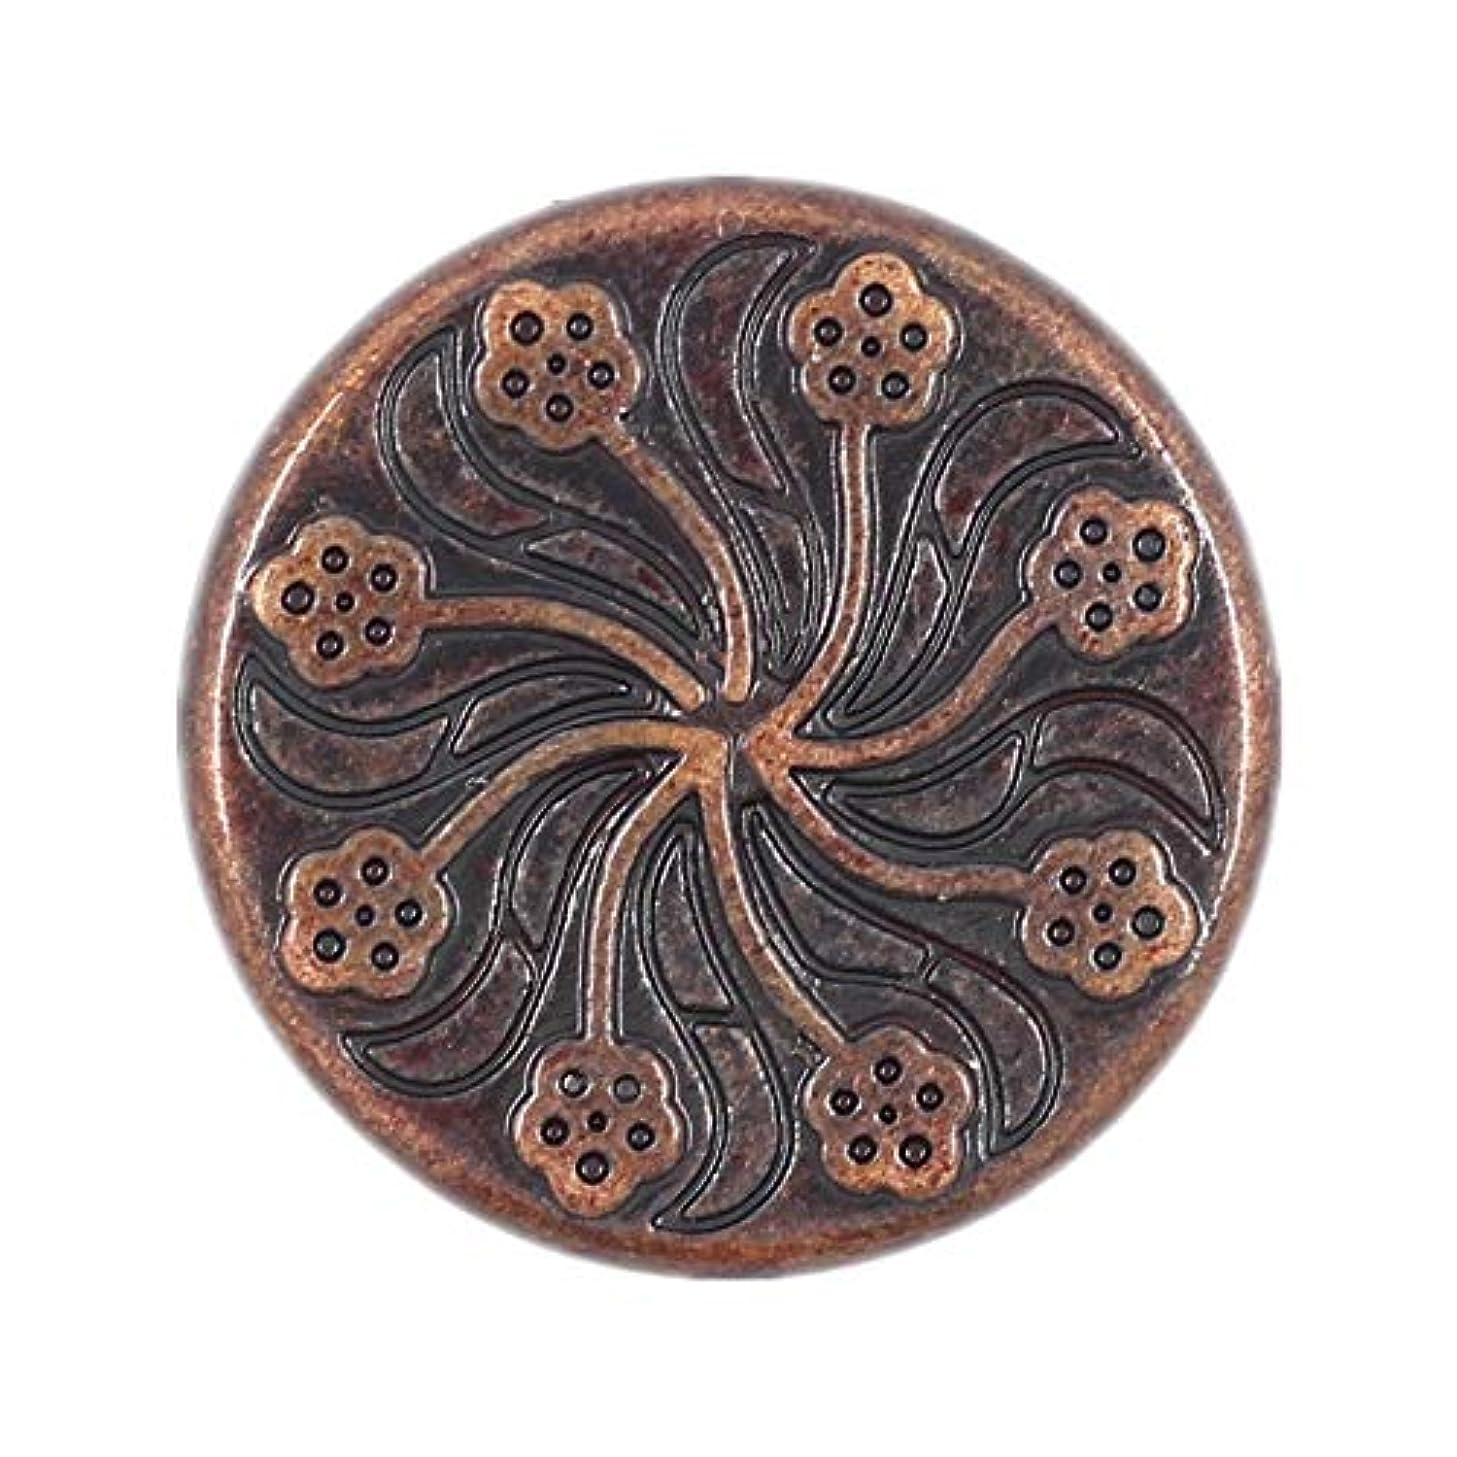 Bezelry 12 Pieces Flower Flourish Dark Copper Color Metal Shank Buttons. 20mm (3/4 inch) (Dark Copper)